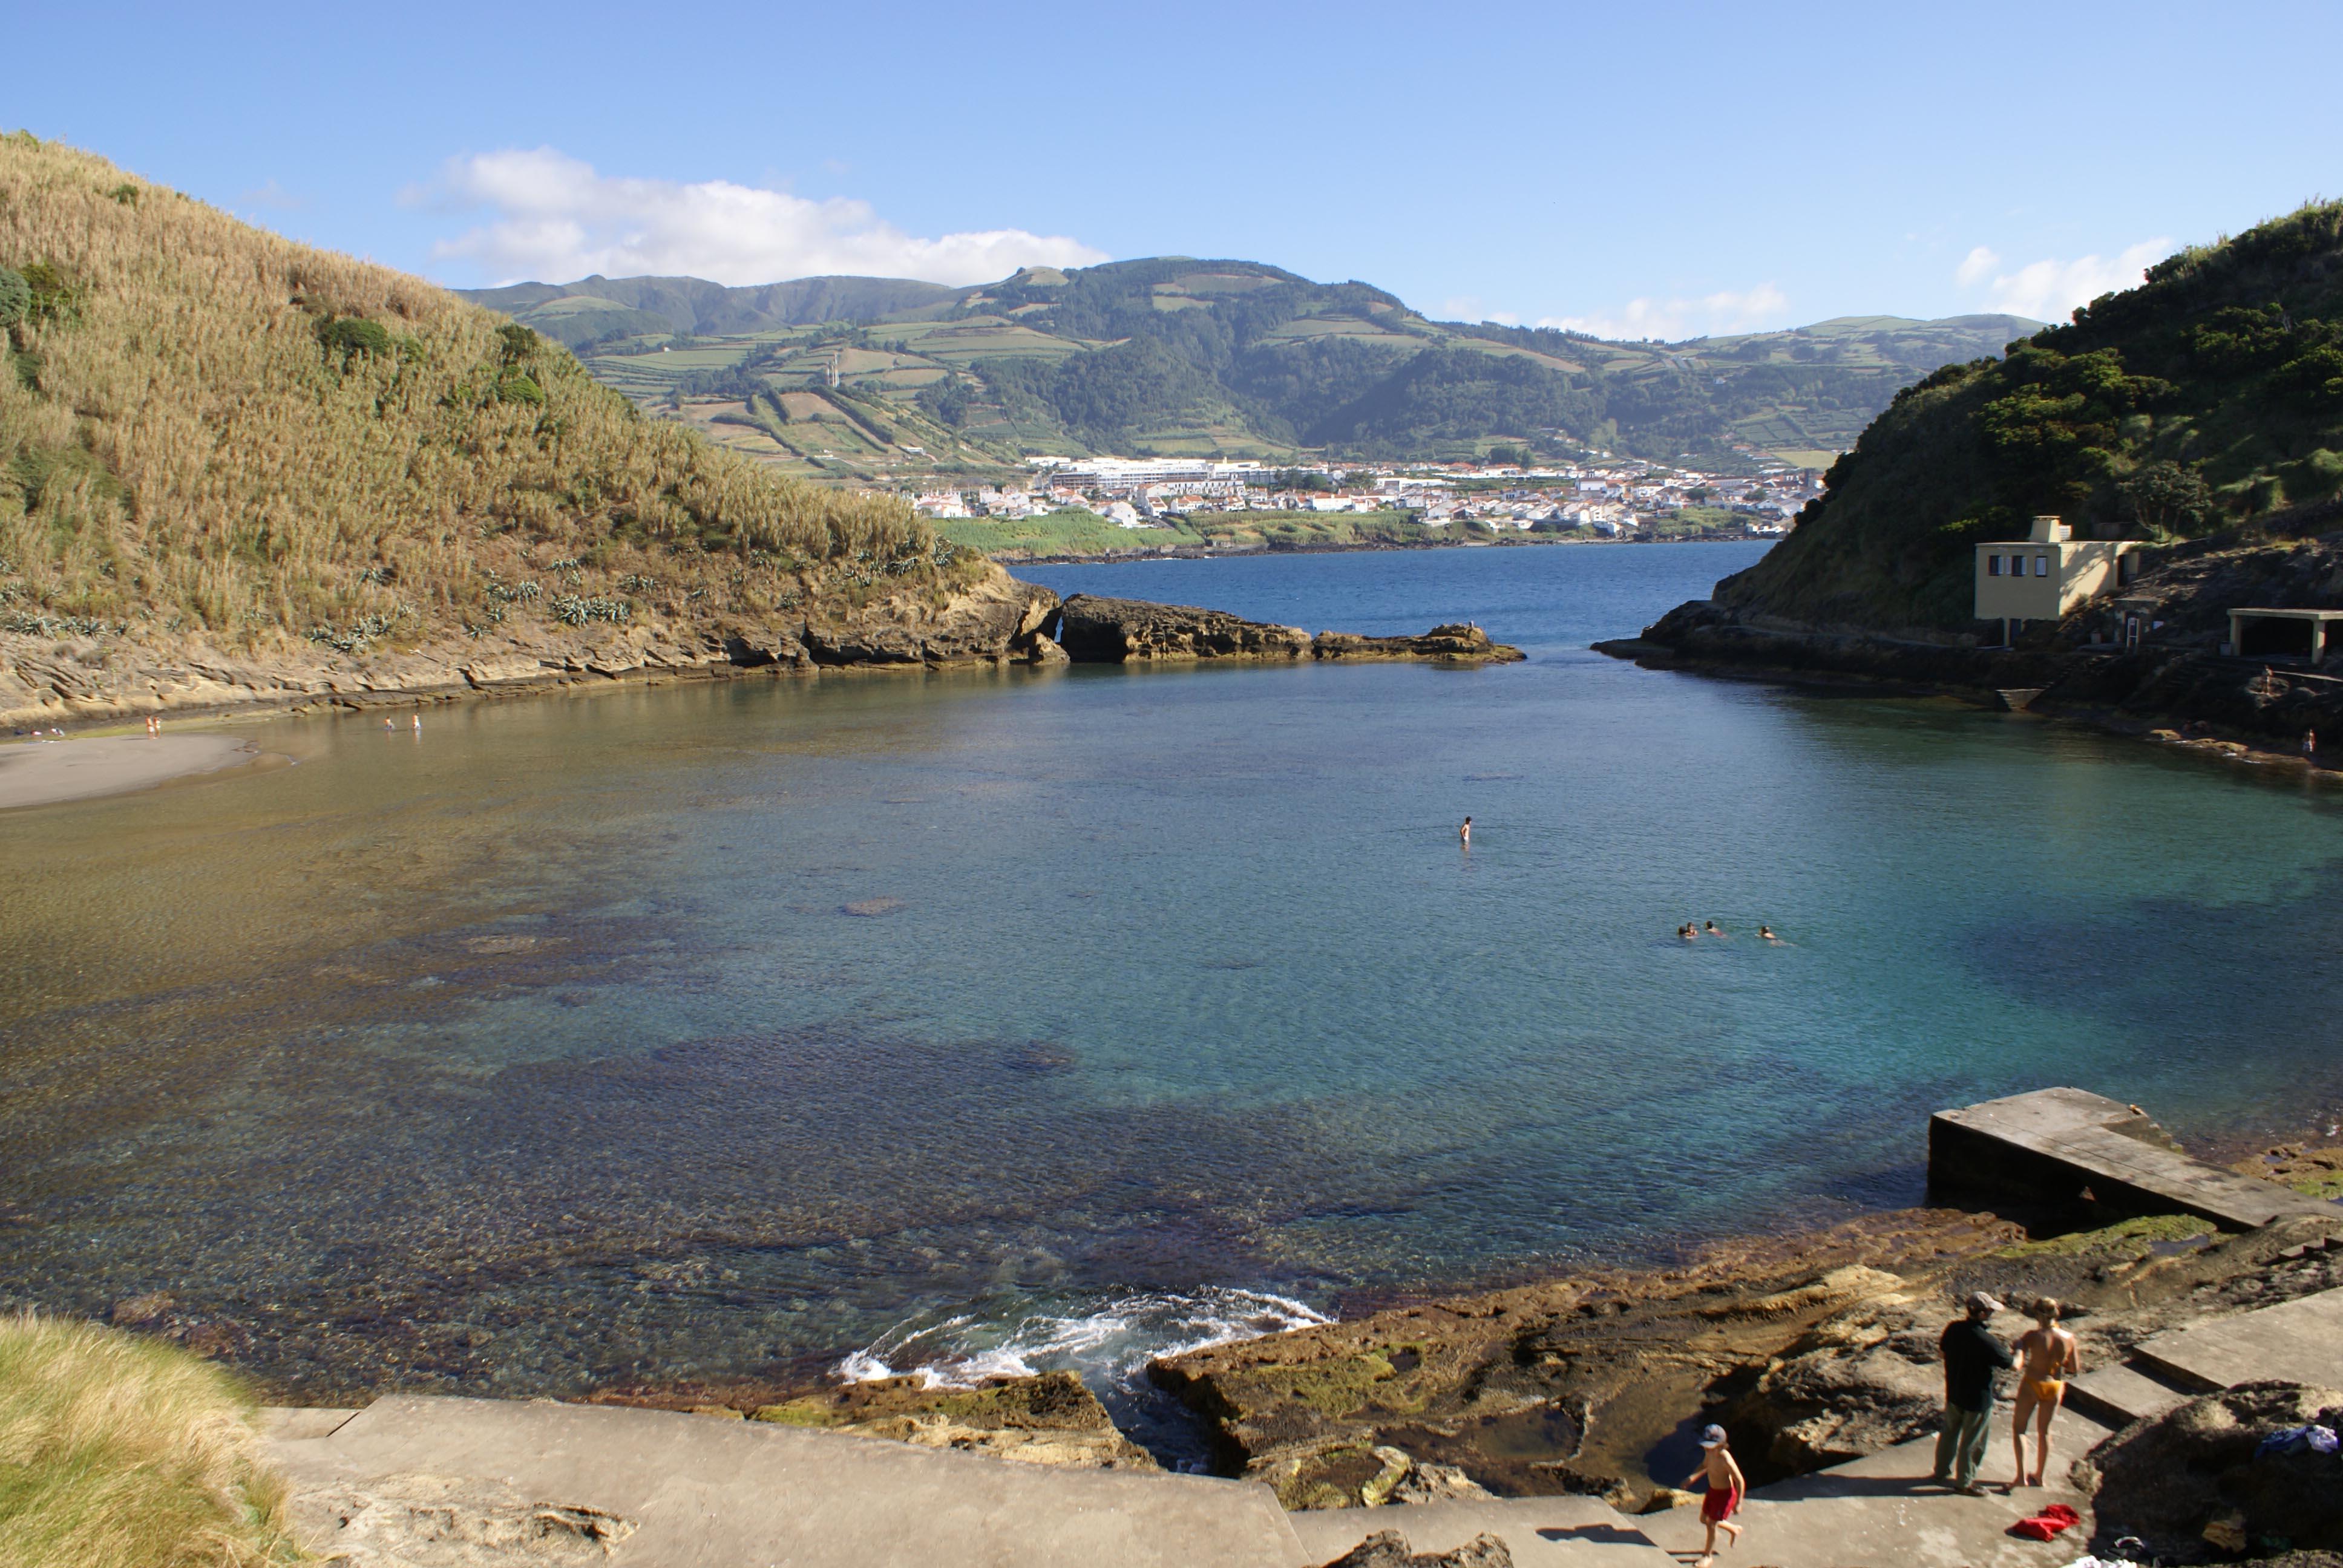 Noleggio Barche Vila Franca do Campo - Navalia | Noleggia un Sogno